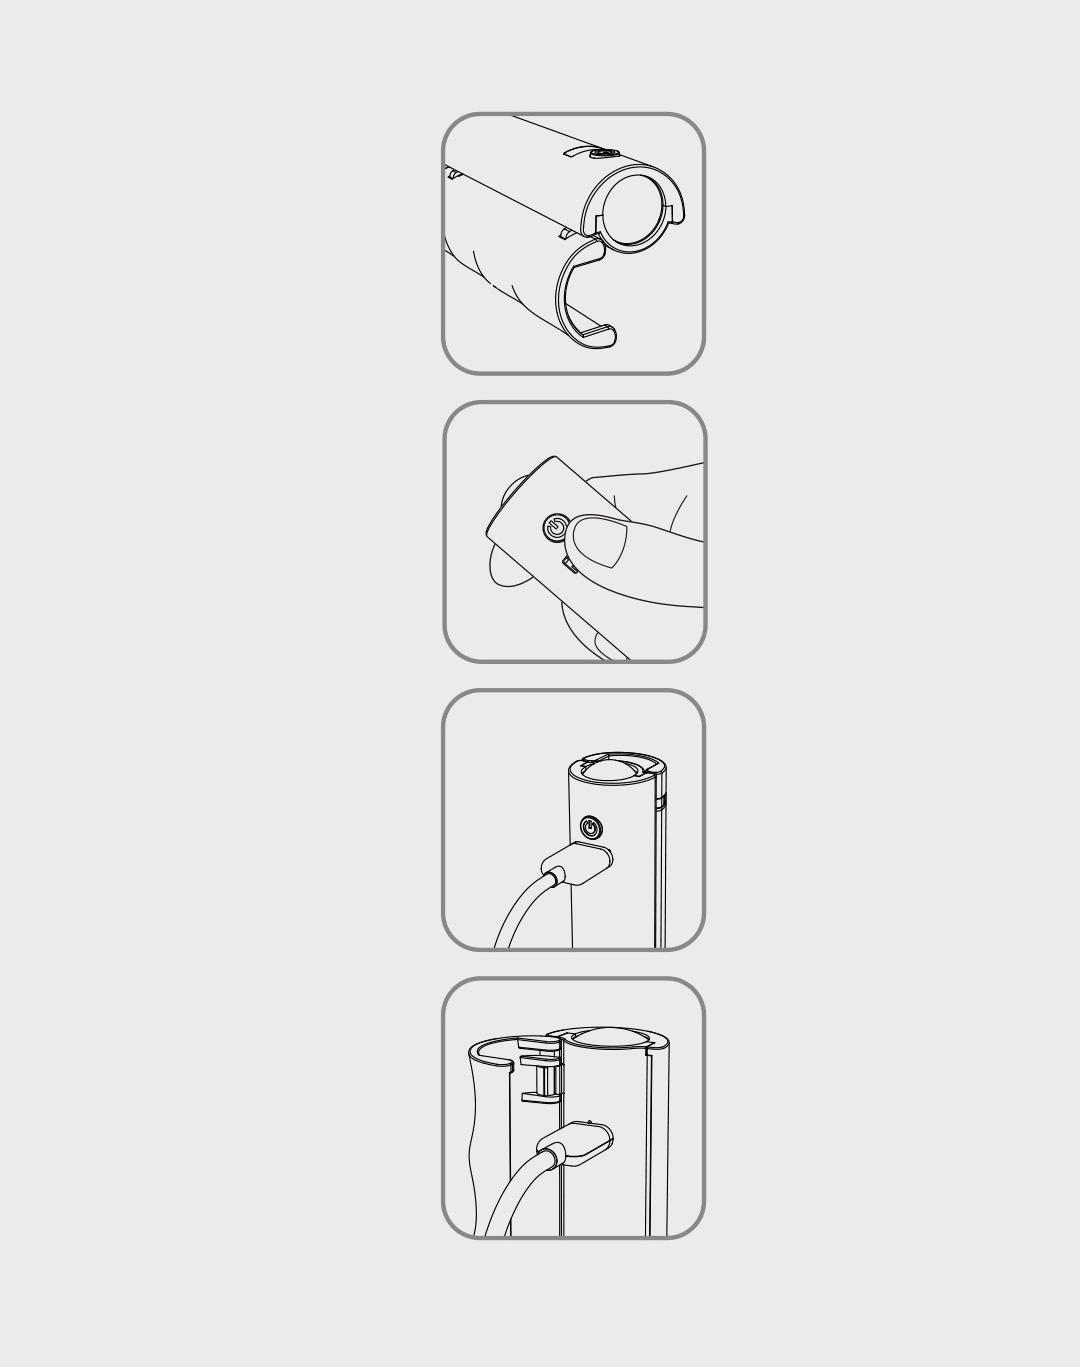 Xiaomi Youle LOVExtend 3in1 Handle Powerbank Flashlight